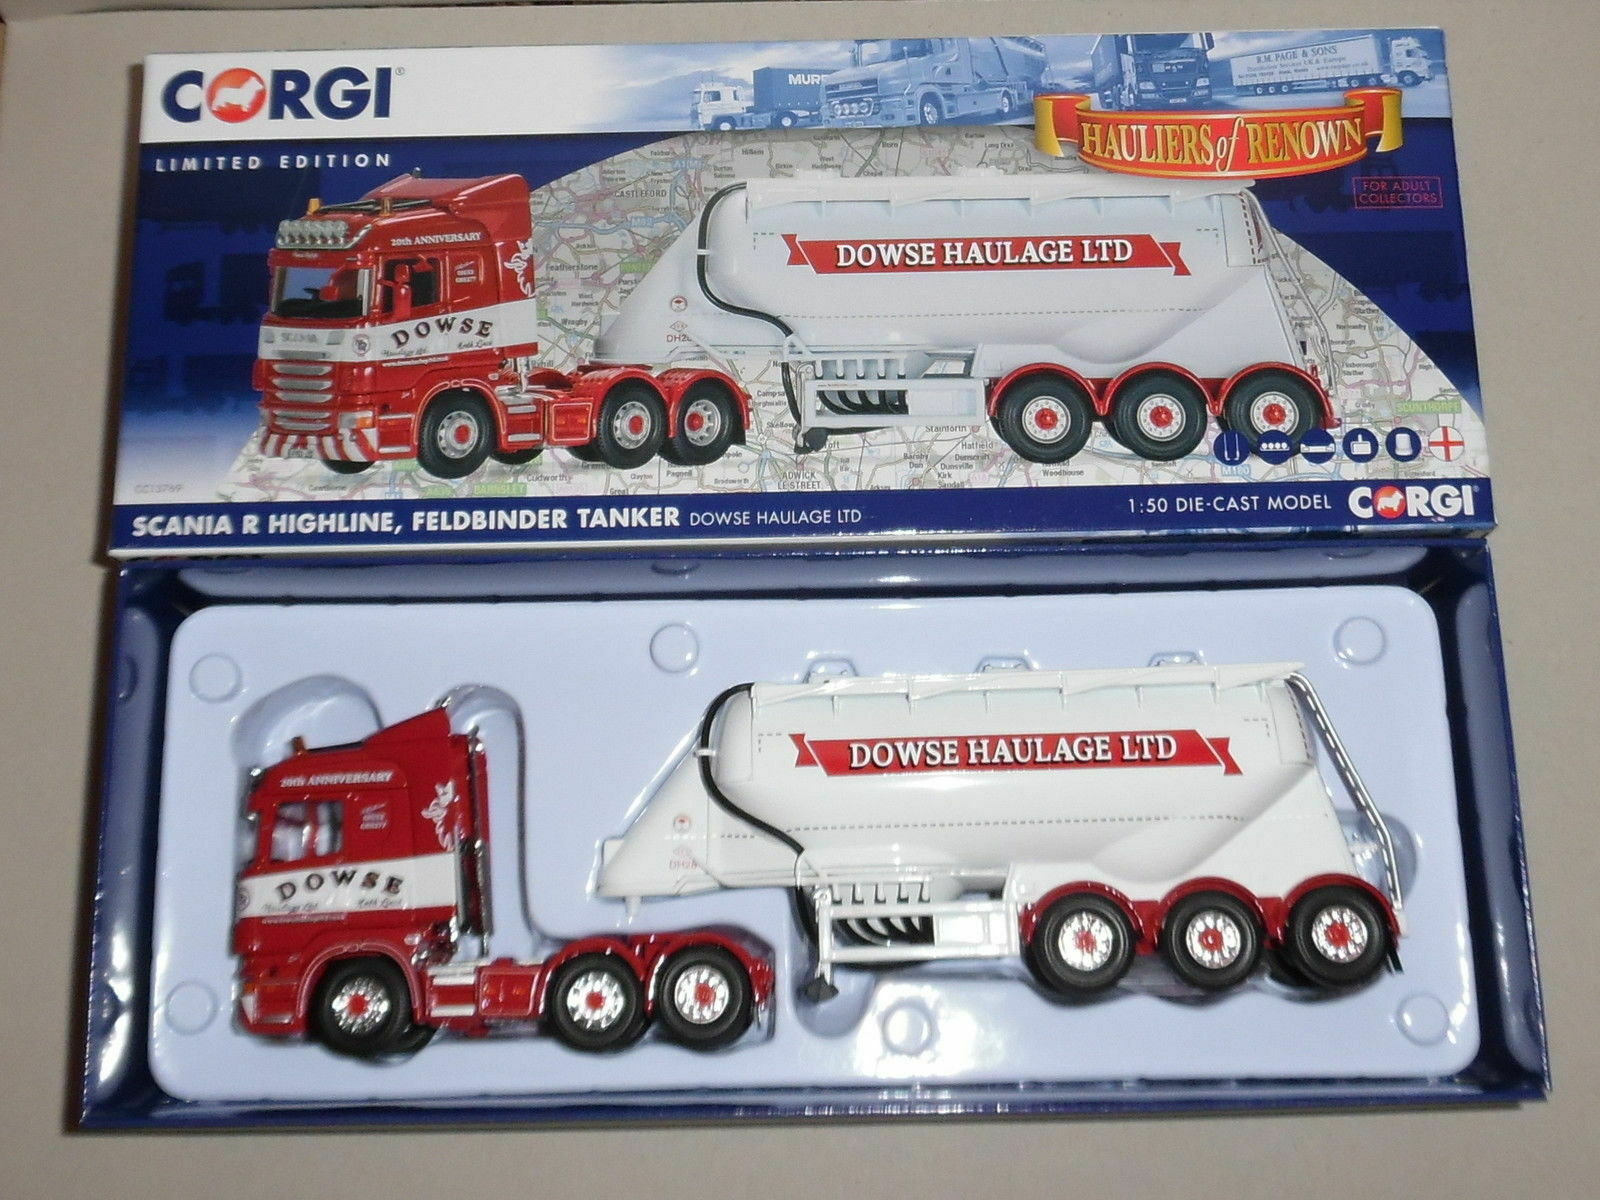 Corgi Classics CC13769 - Scania R Highline, Feldbinder Tanker, Dowse Haulage